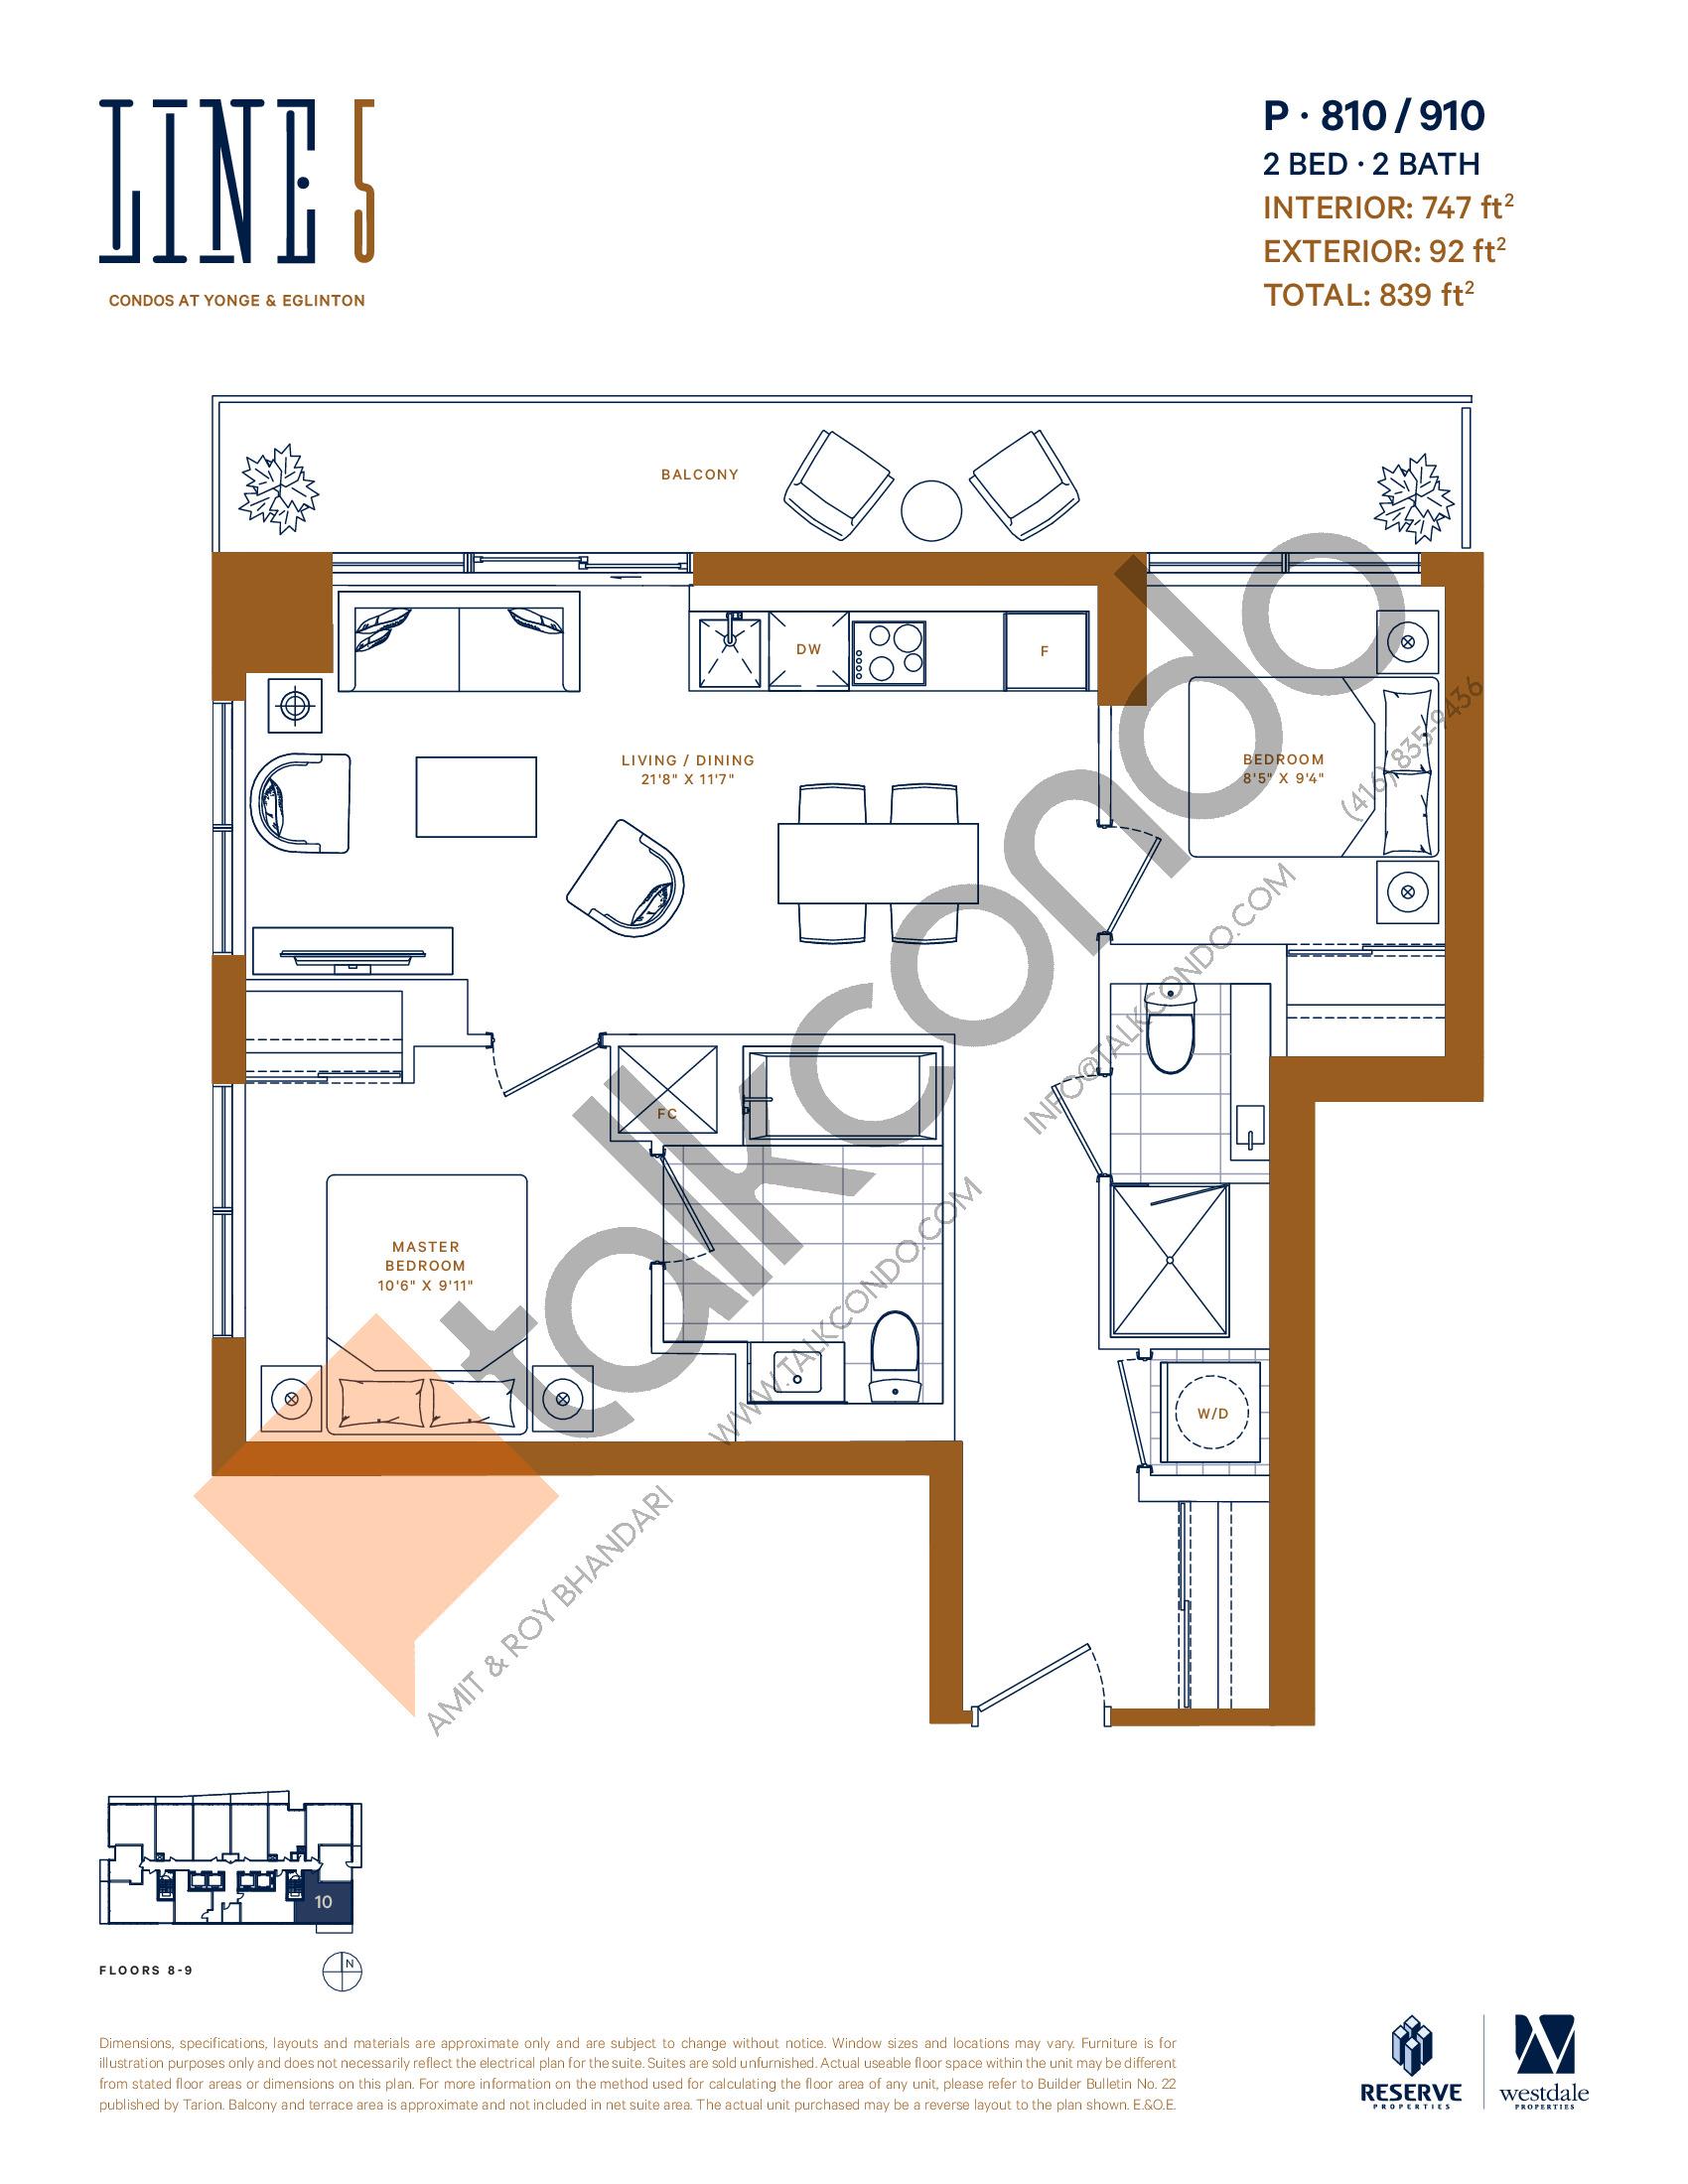 P-810 / 910 Floor Plan at Line 5 Condos - 747 sq.ft